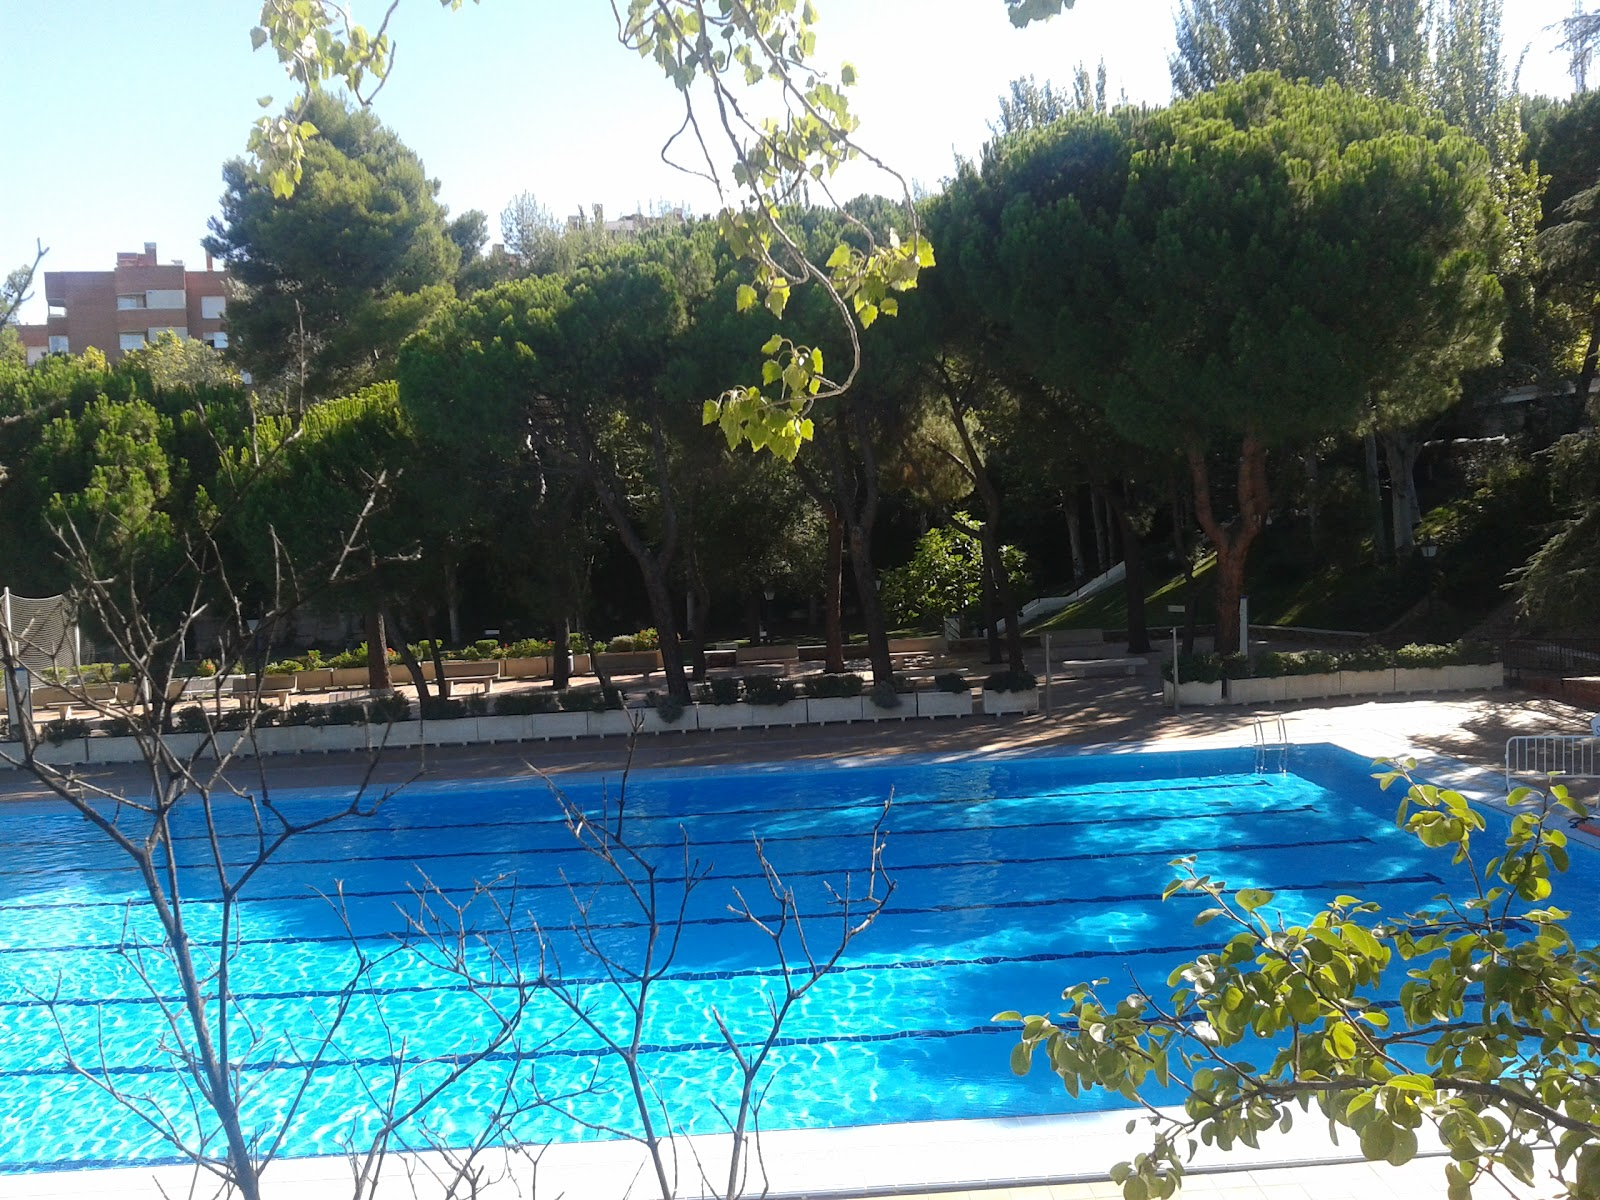 Nosolometro ltimo fin de semana de piscinas en madrid for Madrid piscinas municipales